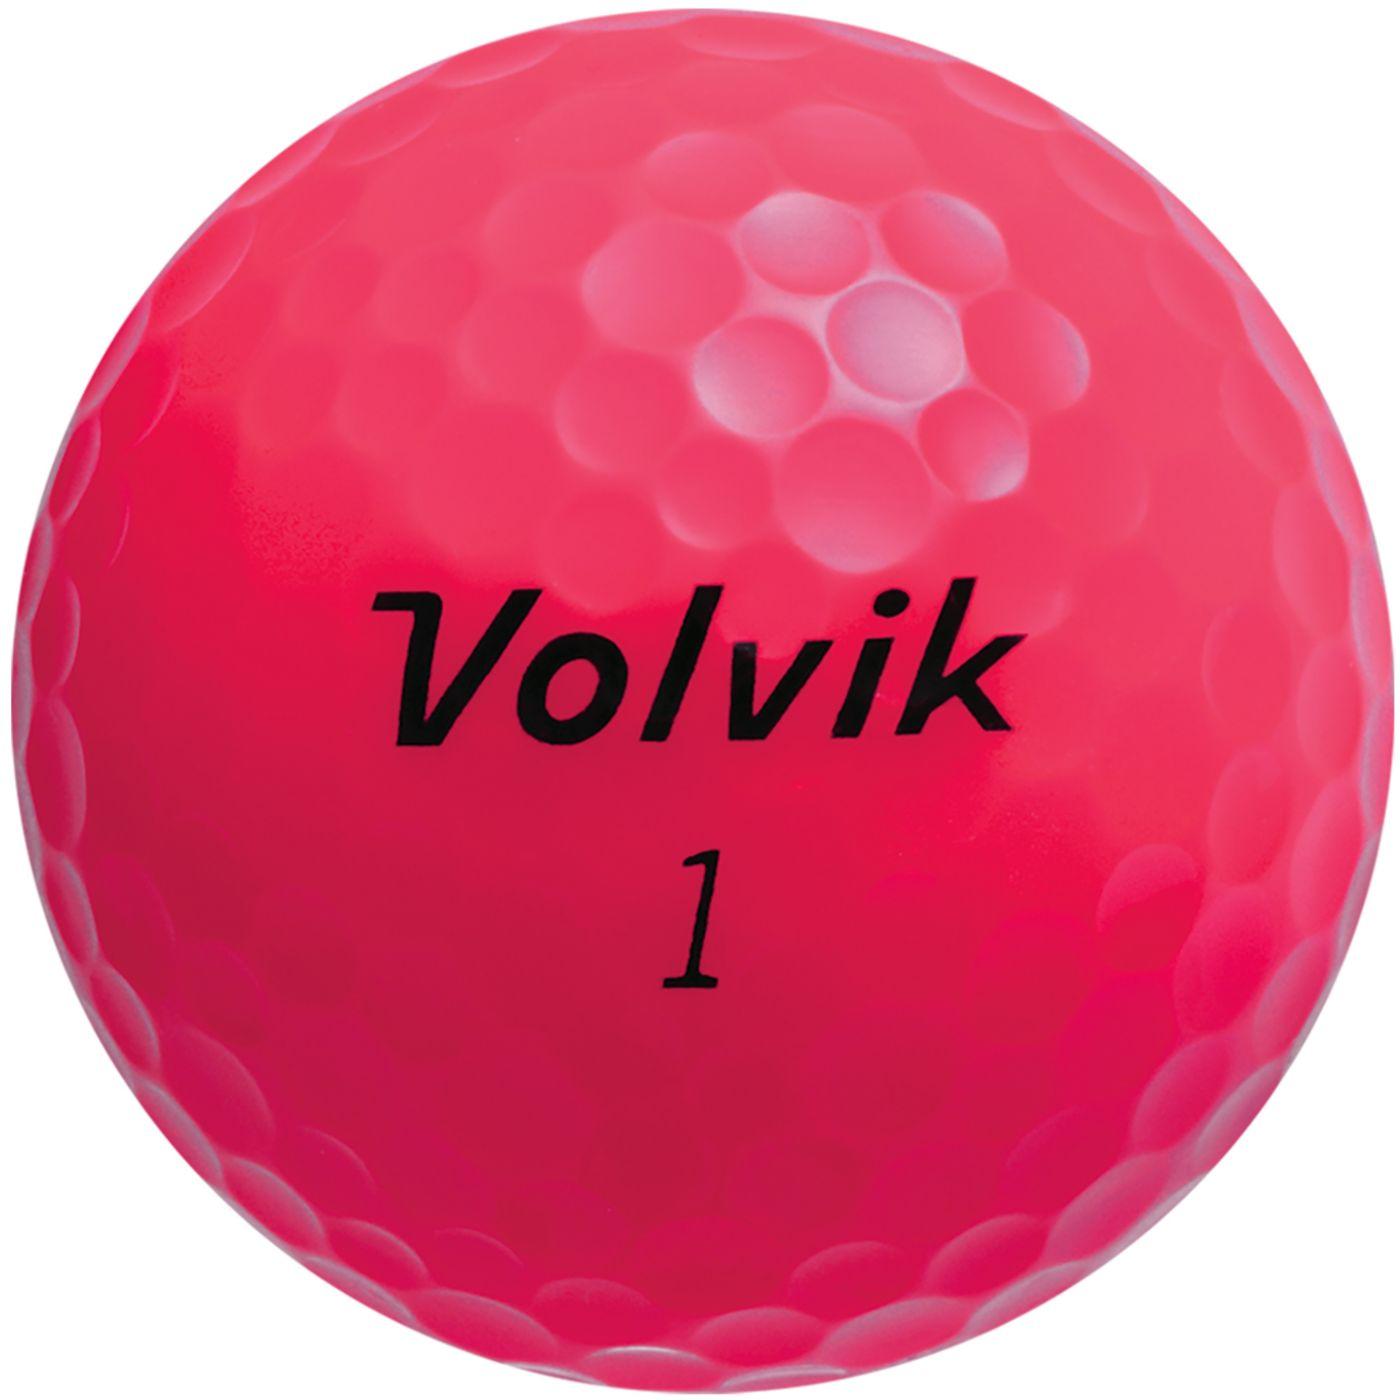 Volvik 2018 Crystal Pink Golf Balls